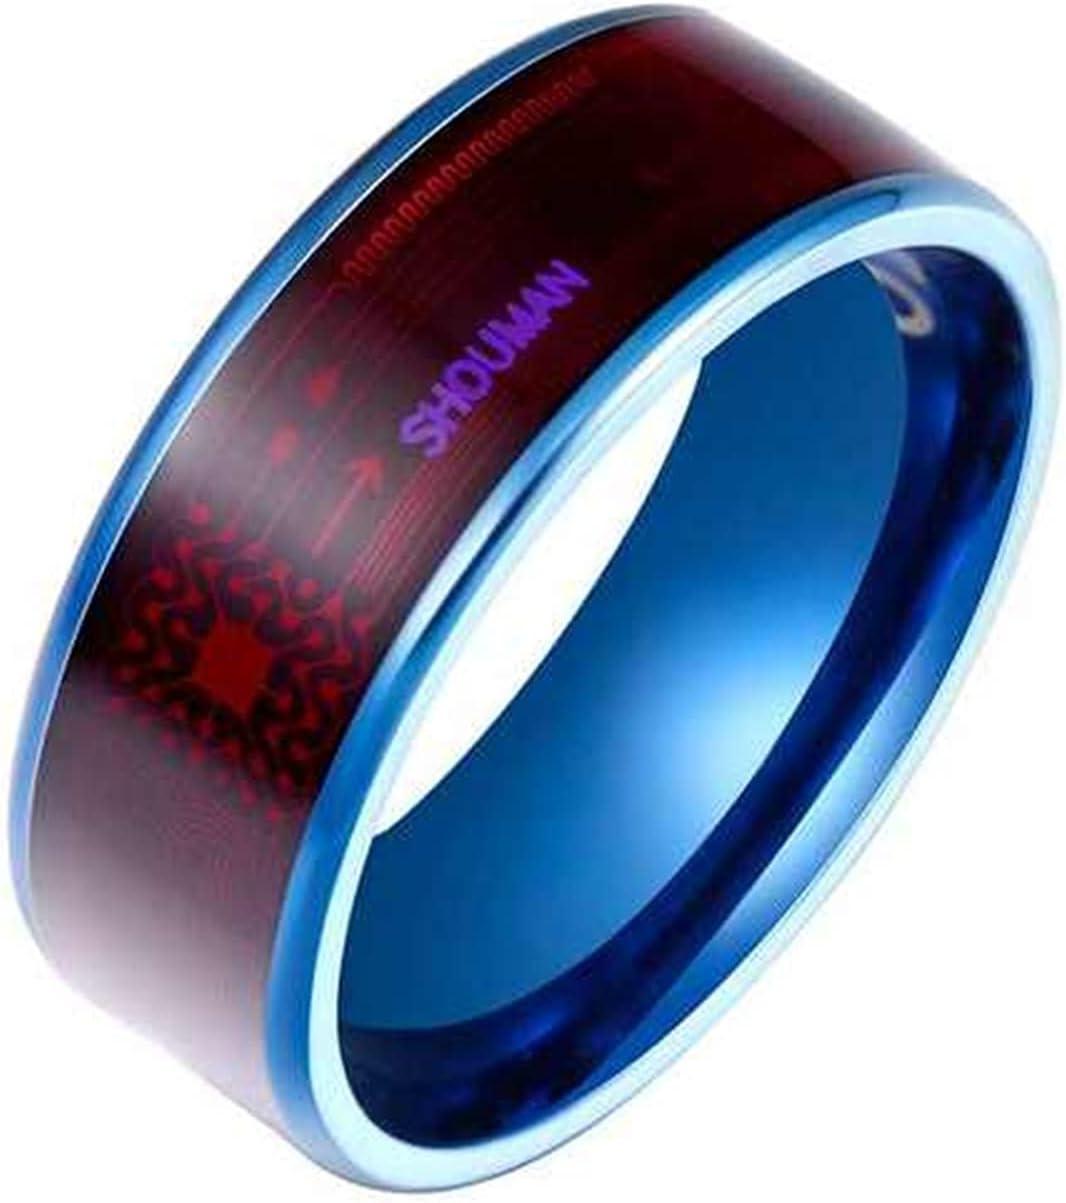 SHAYU Mode Mannen Ring Magie Slijtage NFC Smart Ring Vinger Digitale Ring Voor Android Telefoons Met Functionele Paar Rvs Ring (Color : B, Size : 9)